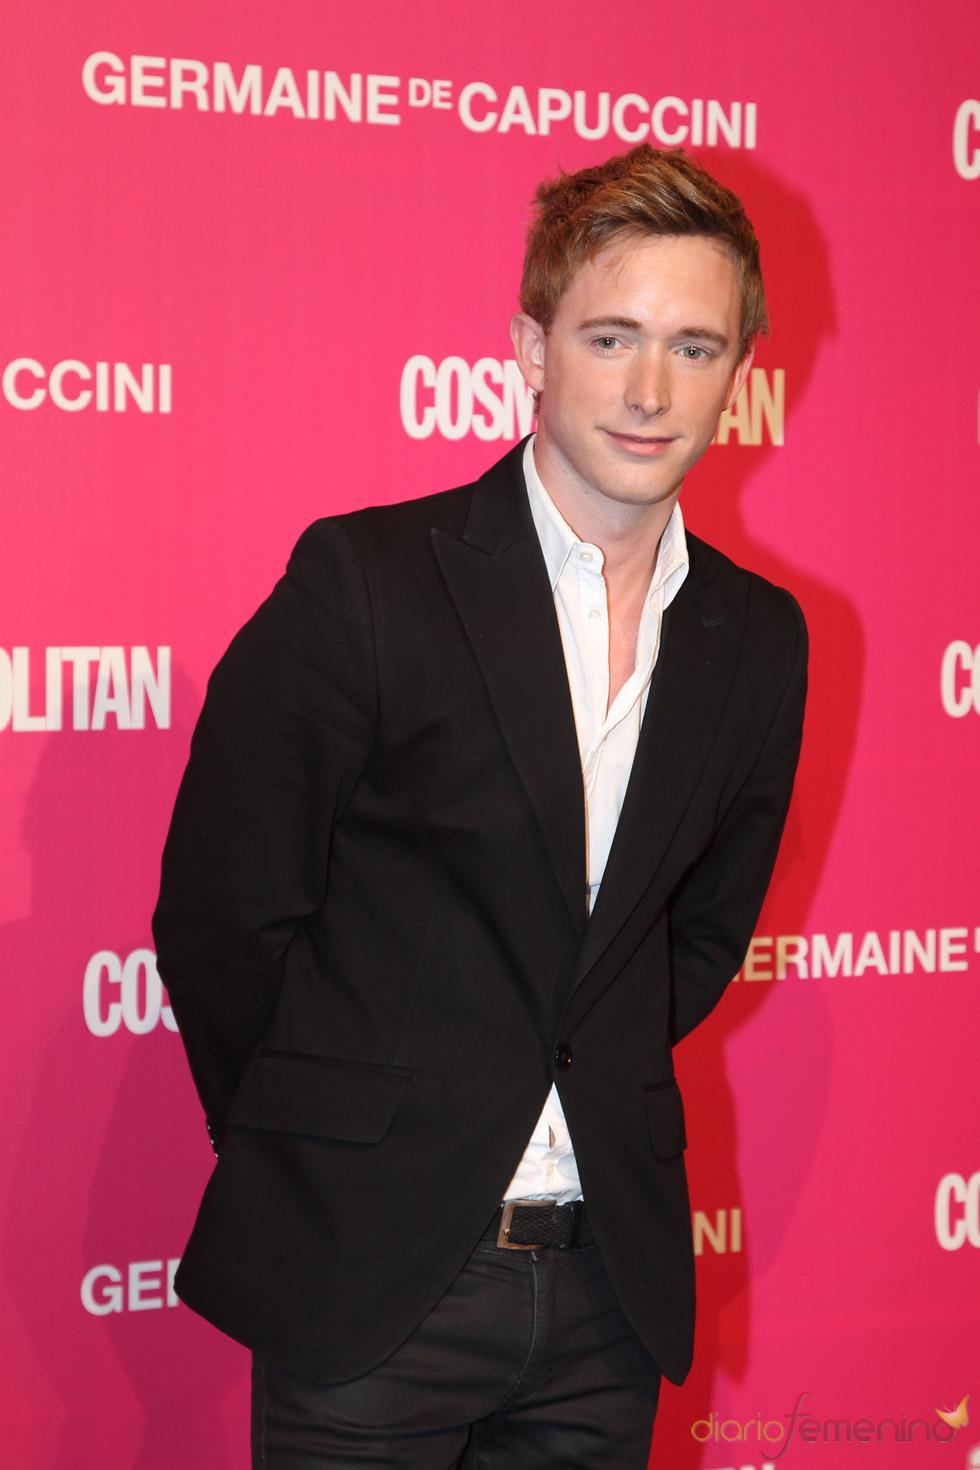 Premios Cosmopolitan 2010: Pablo Rivero